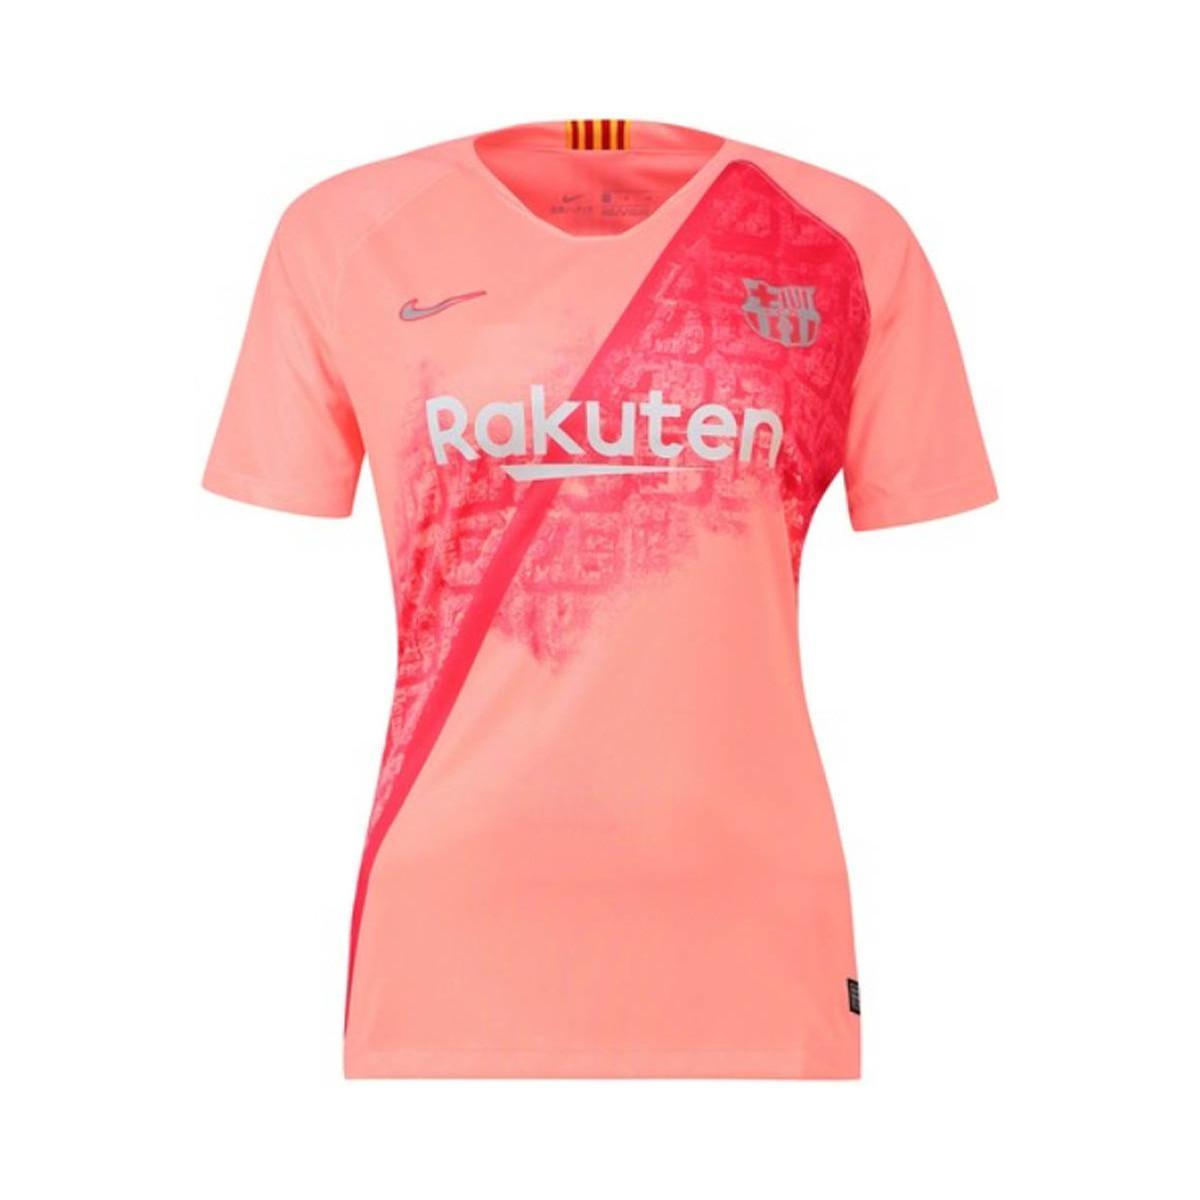 aba31dd7d Nike 2018-2019 Barcelona Third Football Shirt Women s T Shirt In ...